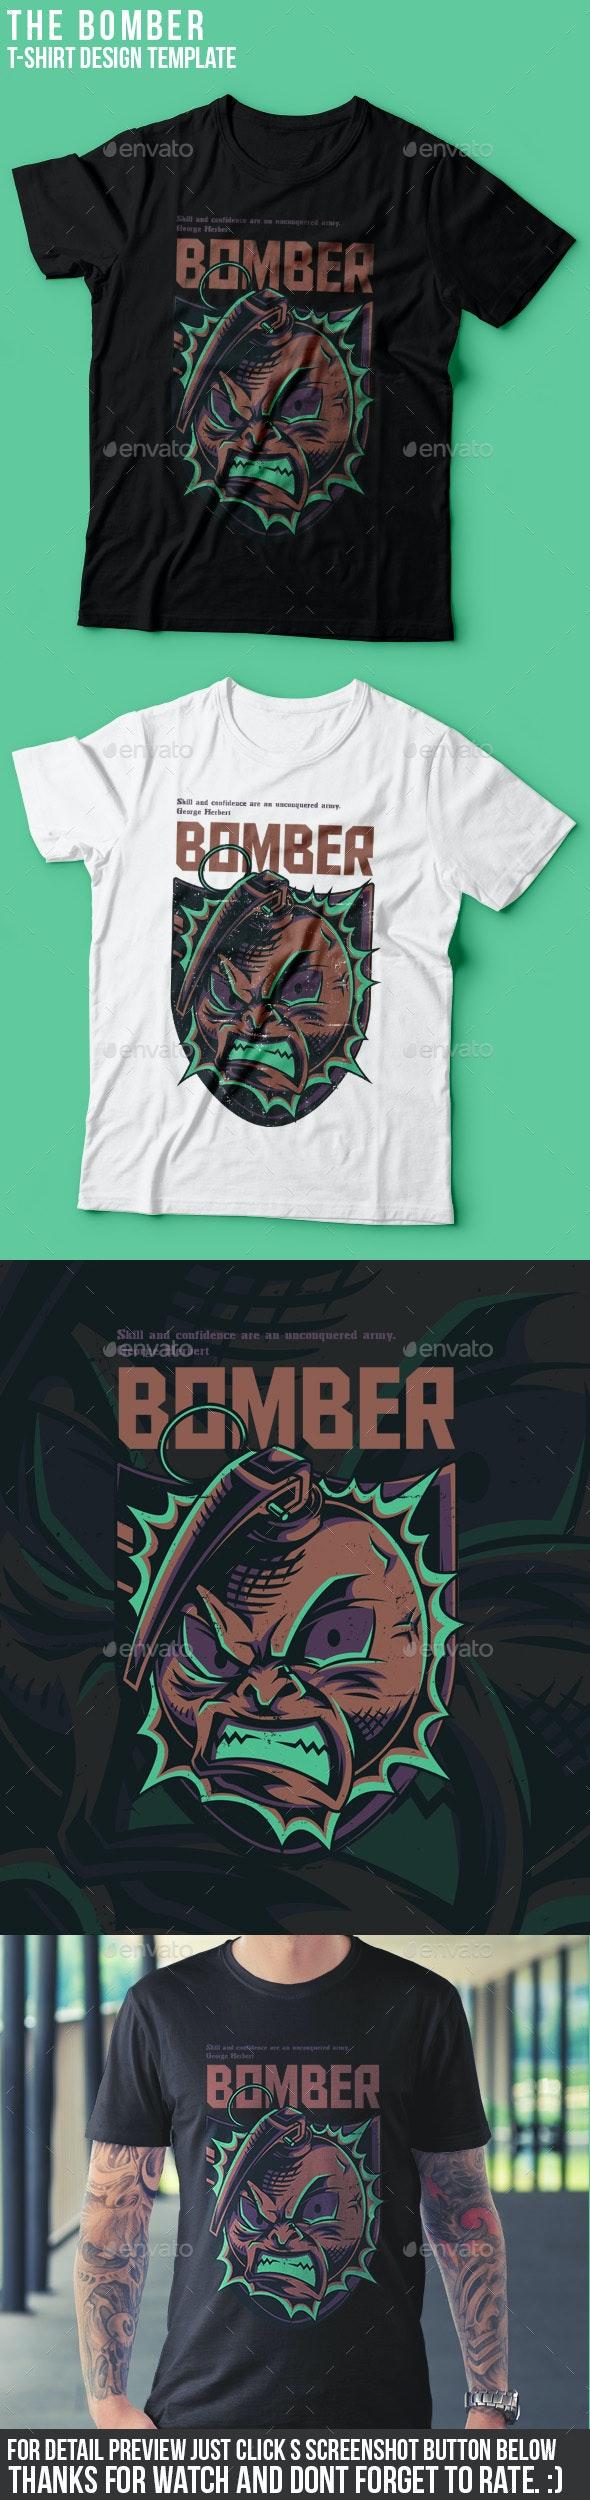 The Bomber T-Shirt Design - Sports & Teams T-Shirts